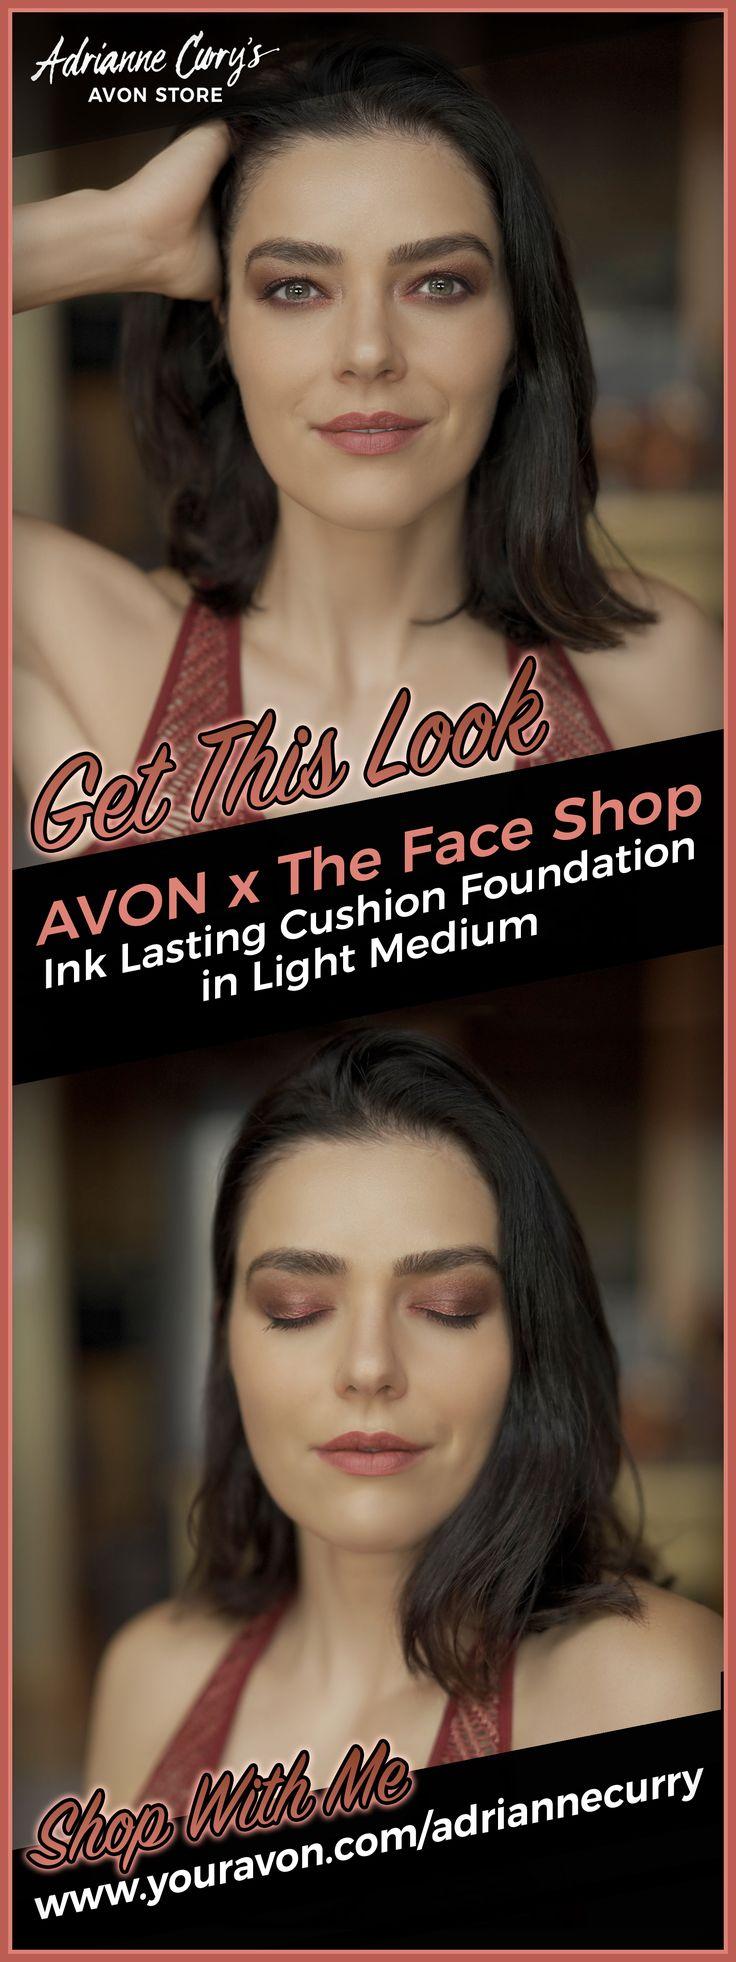 Get our new Korean Beauty collab line! avon koreanbeauty